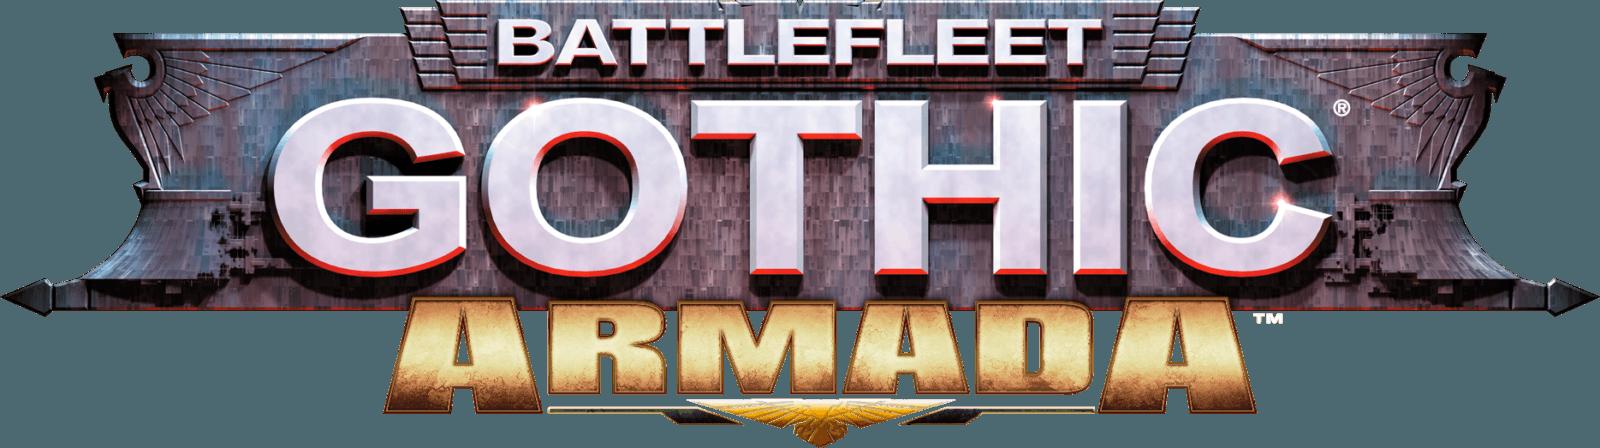 Battlefleet Gothic: Armada - PC Keyboard Shortcuts